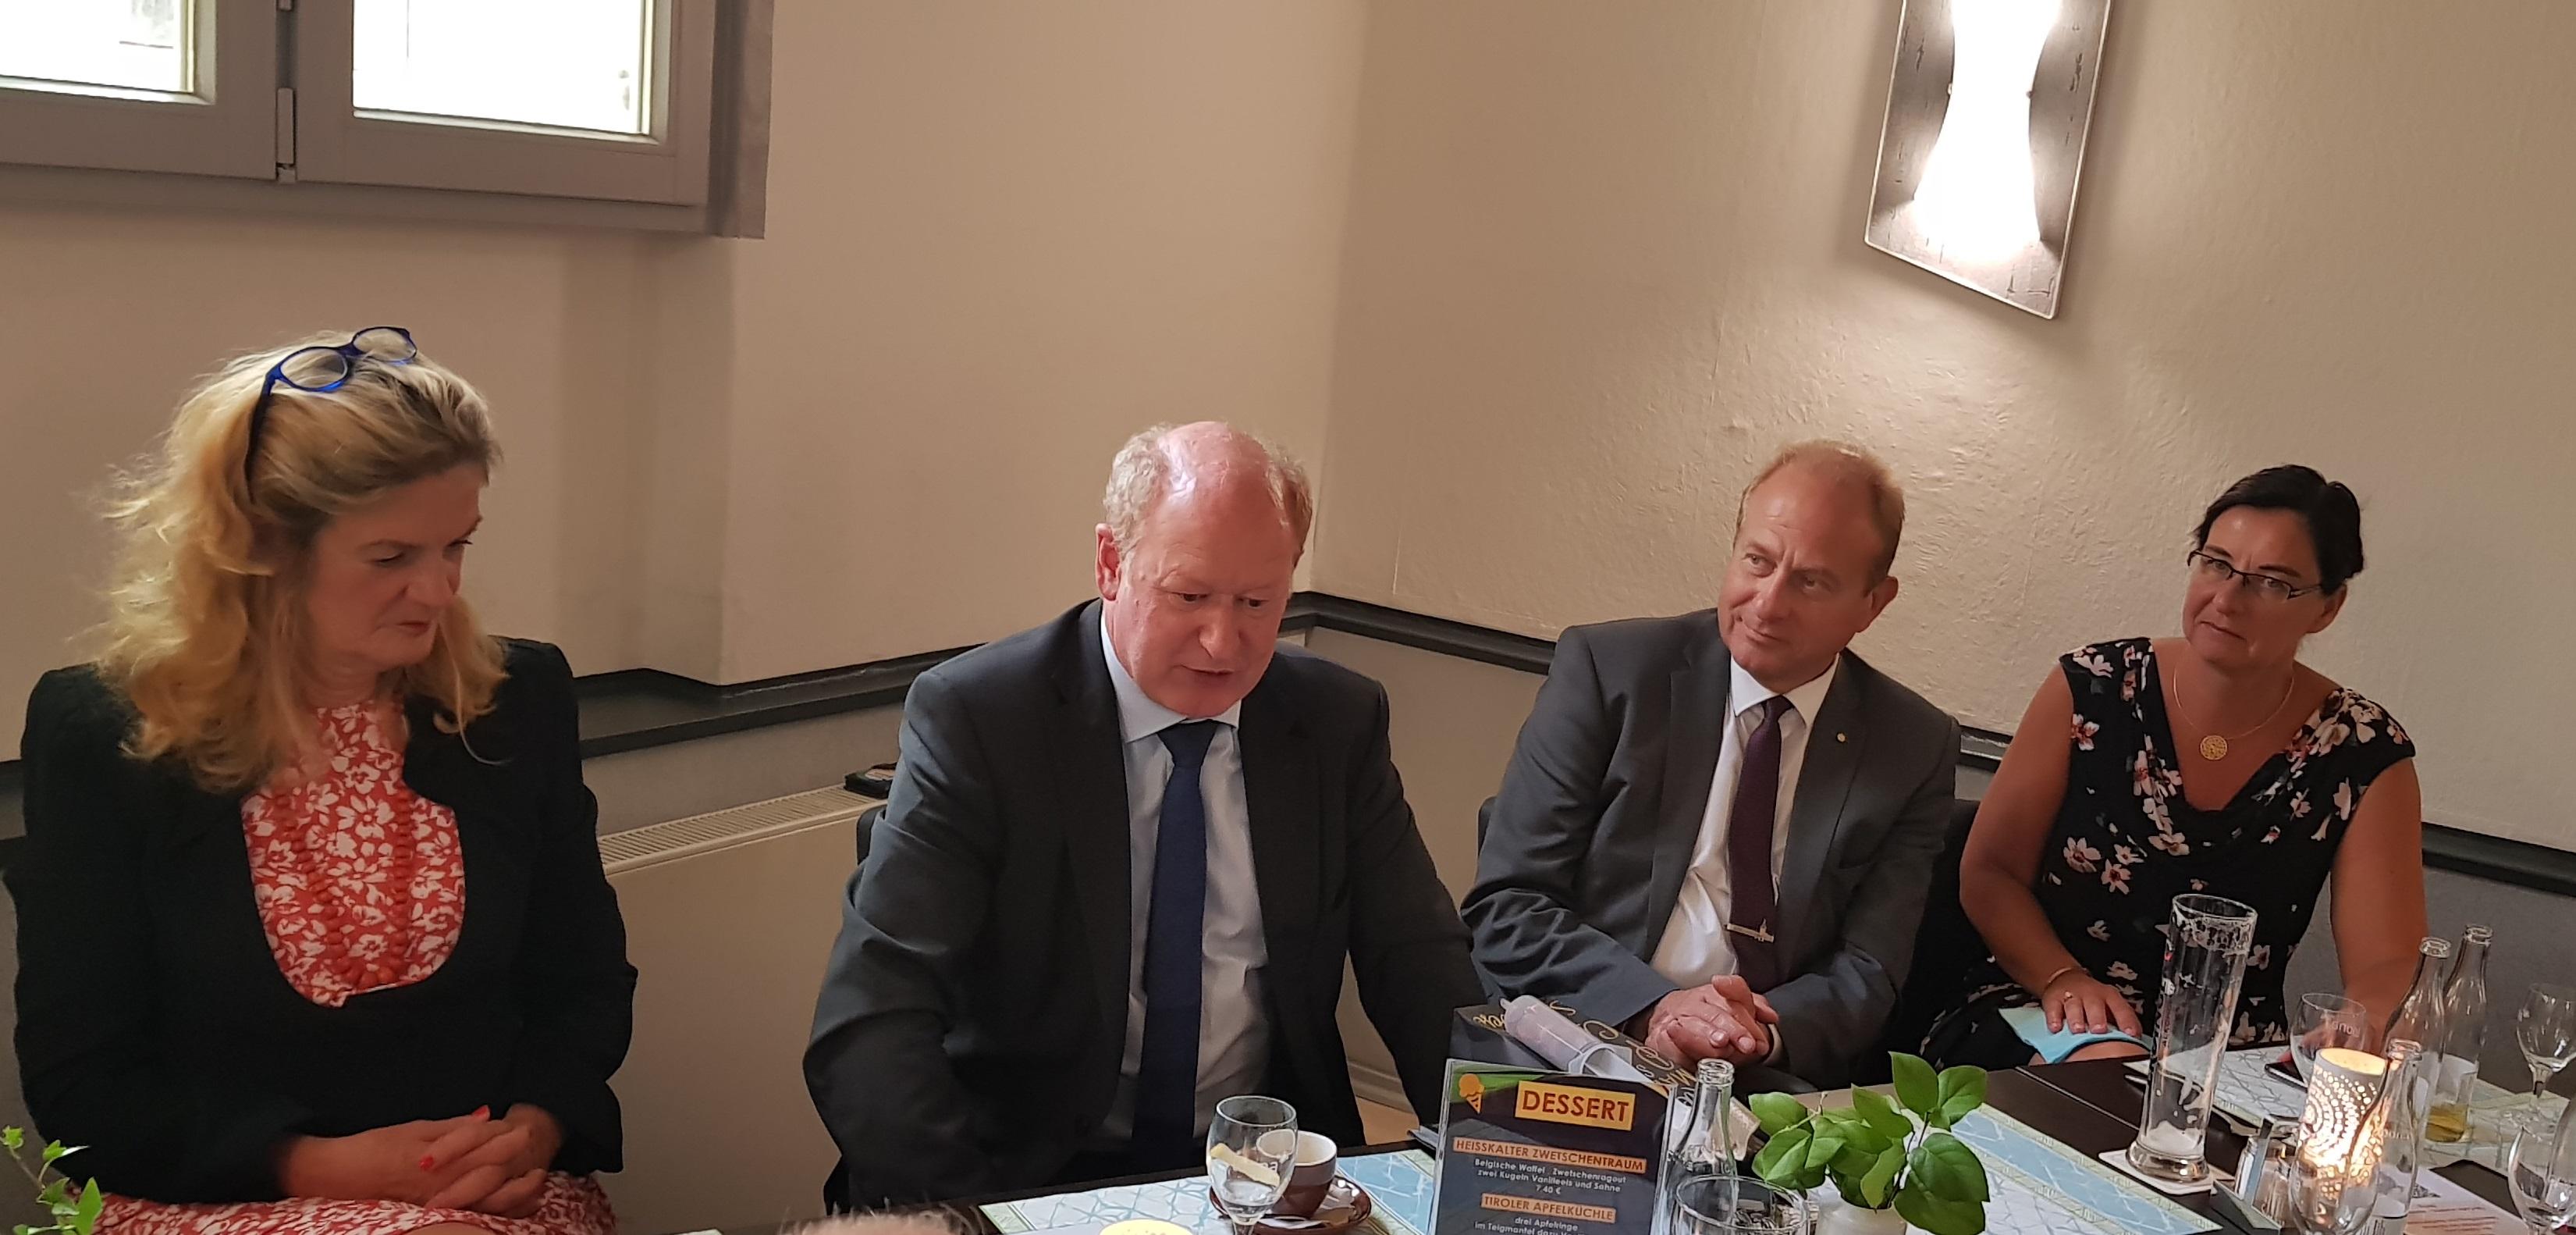 v.l.n.r.: CDU Kreisvorsitzende Elisabeth Heister-Neumann, Finanzminister Reinhold Hilbers, Landrat Gerhard Radeck, Landtagsabgeordnete Veronika Koch